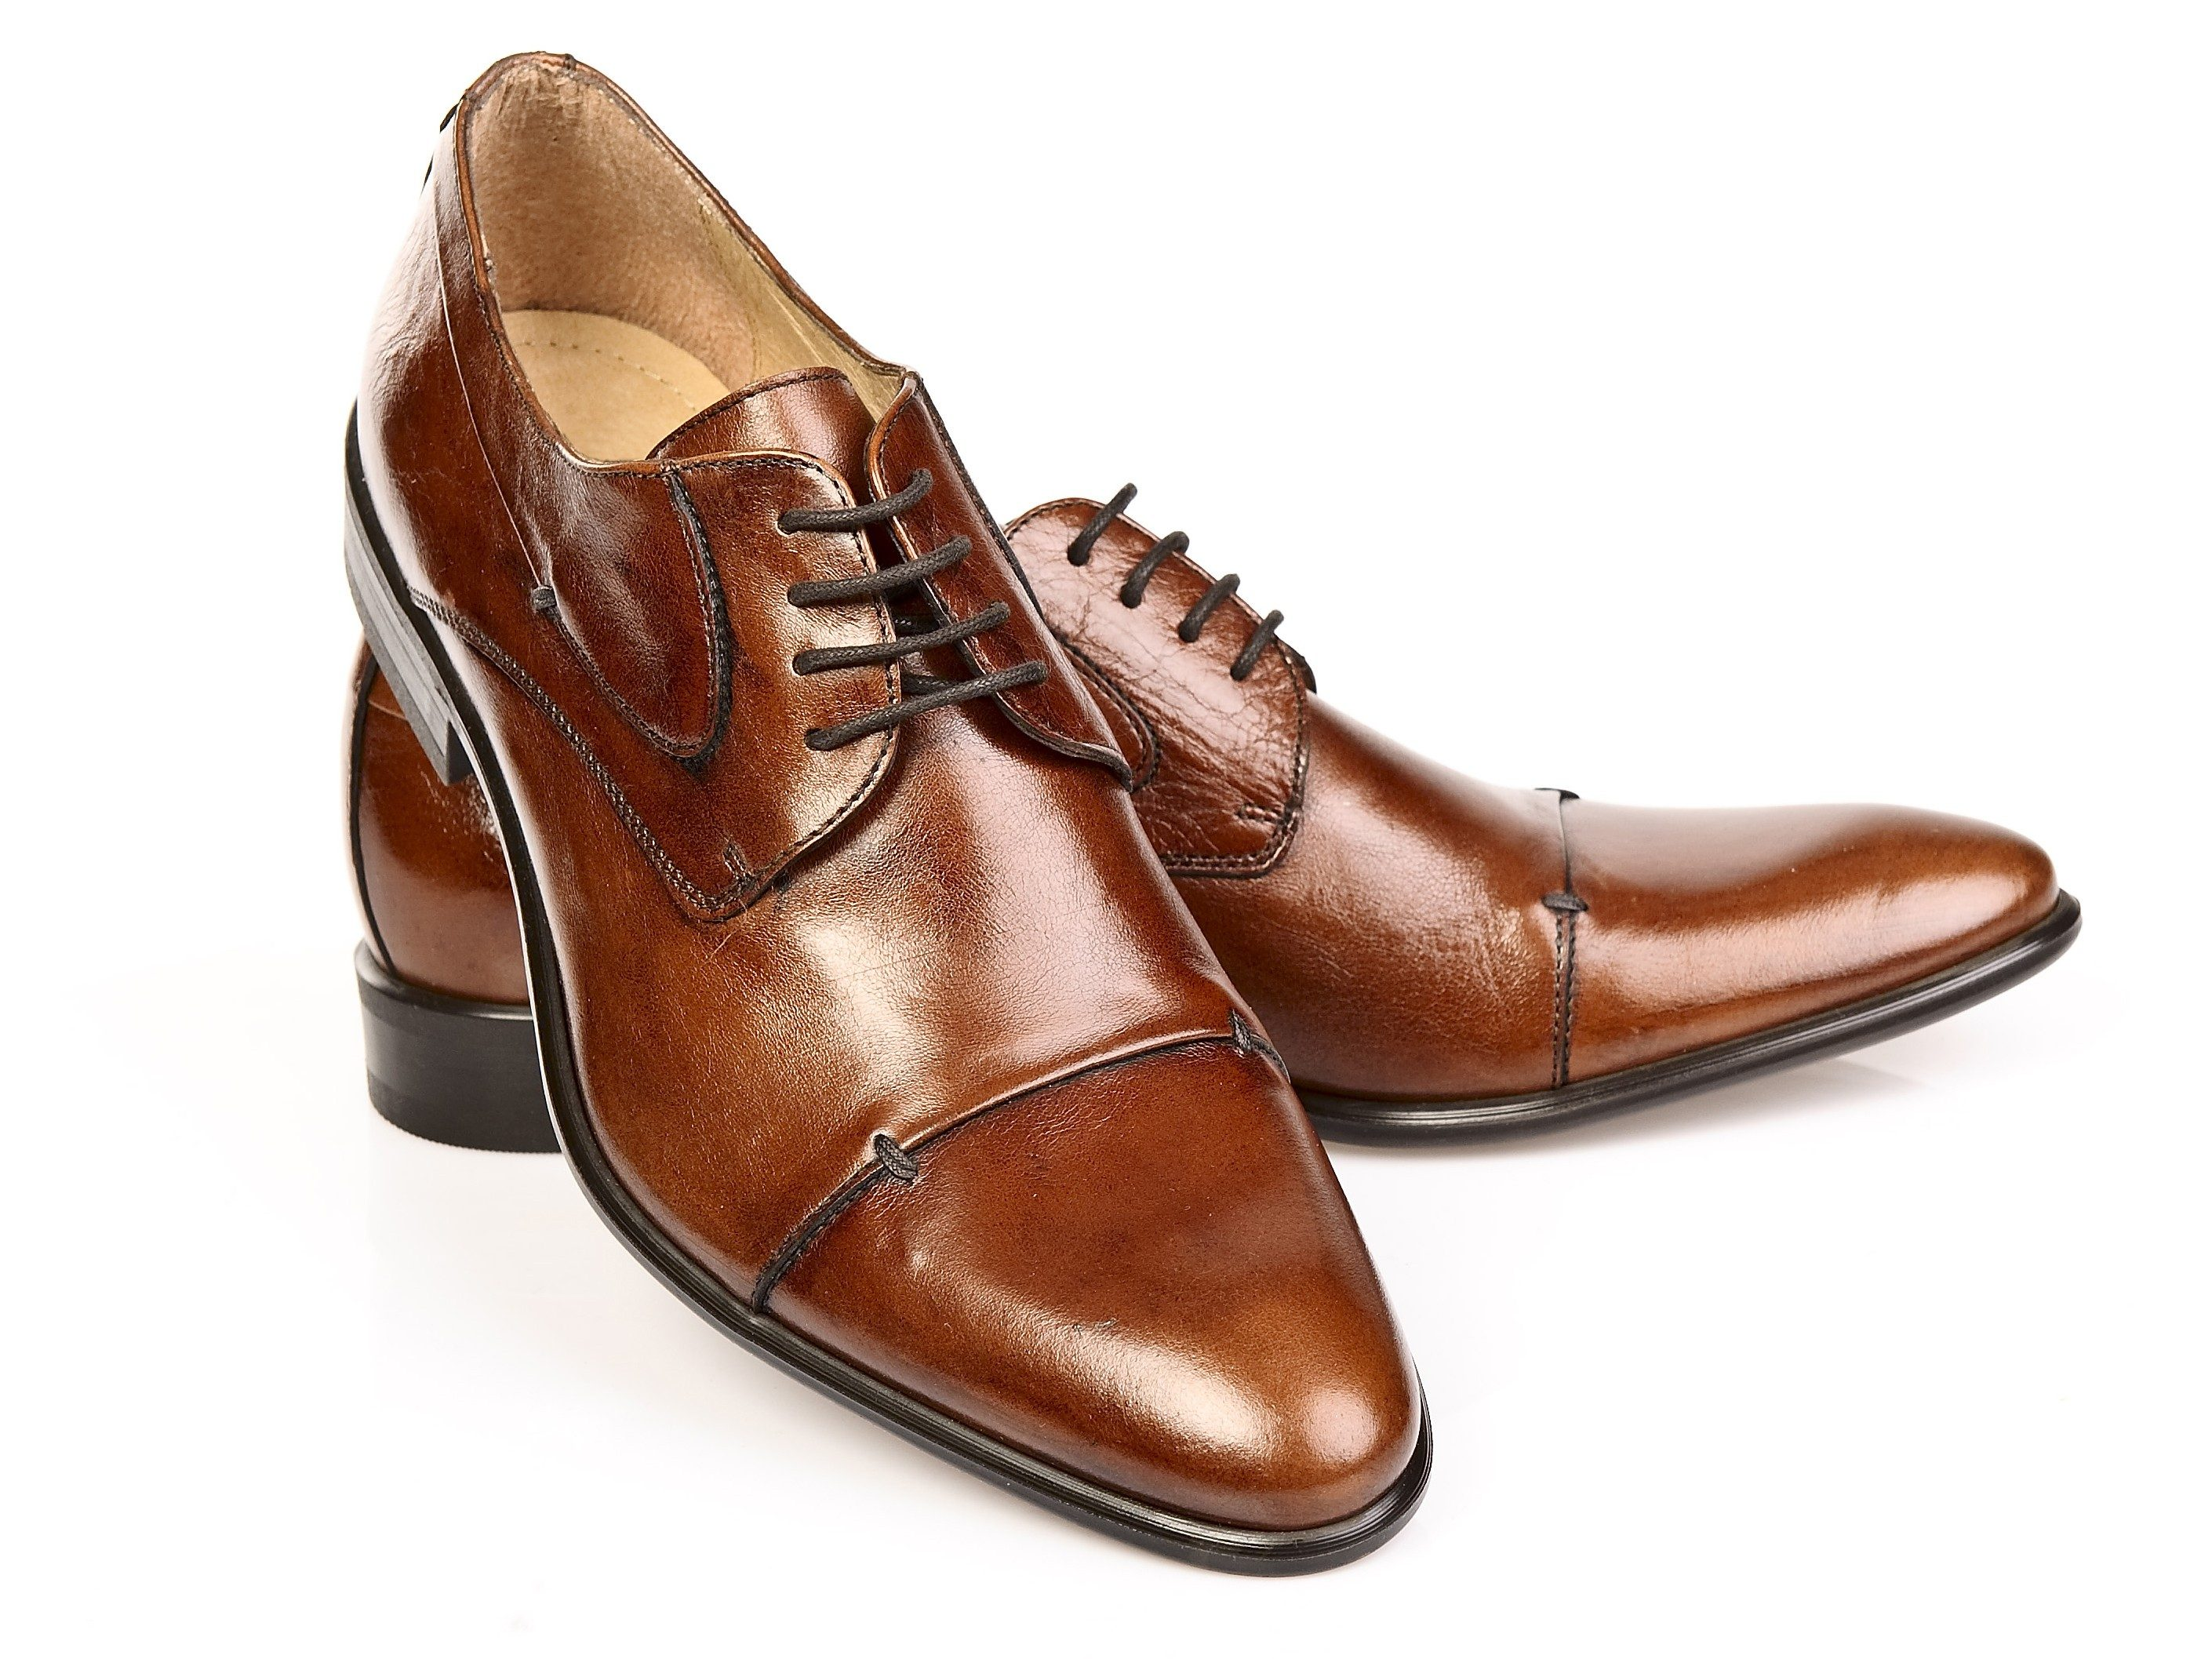 4. Use Shampoo to Revitalize Leather Shoes and Purses